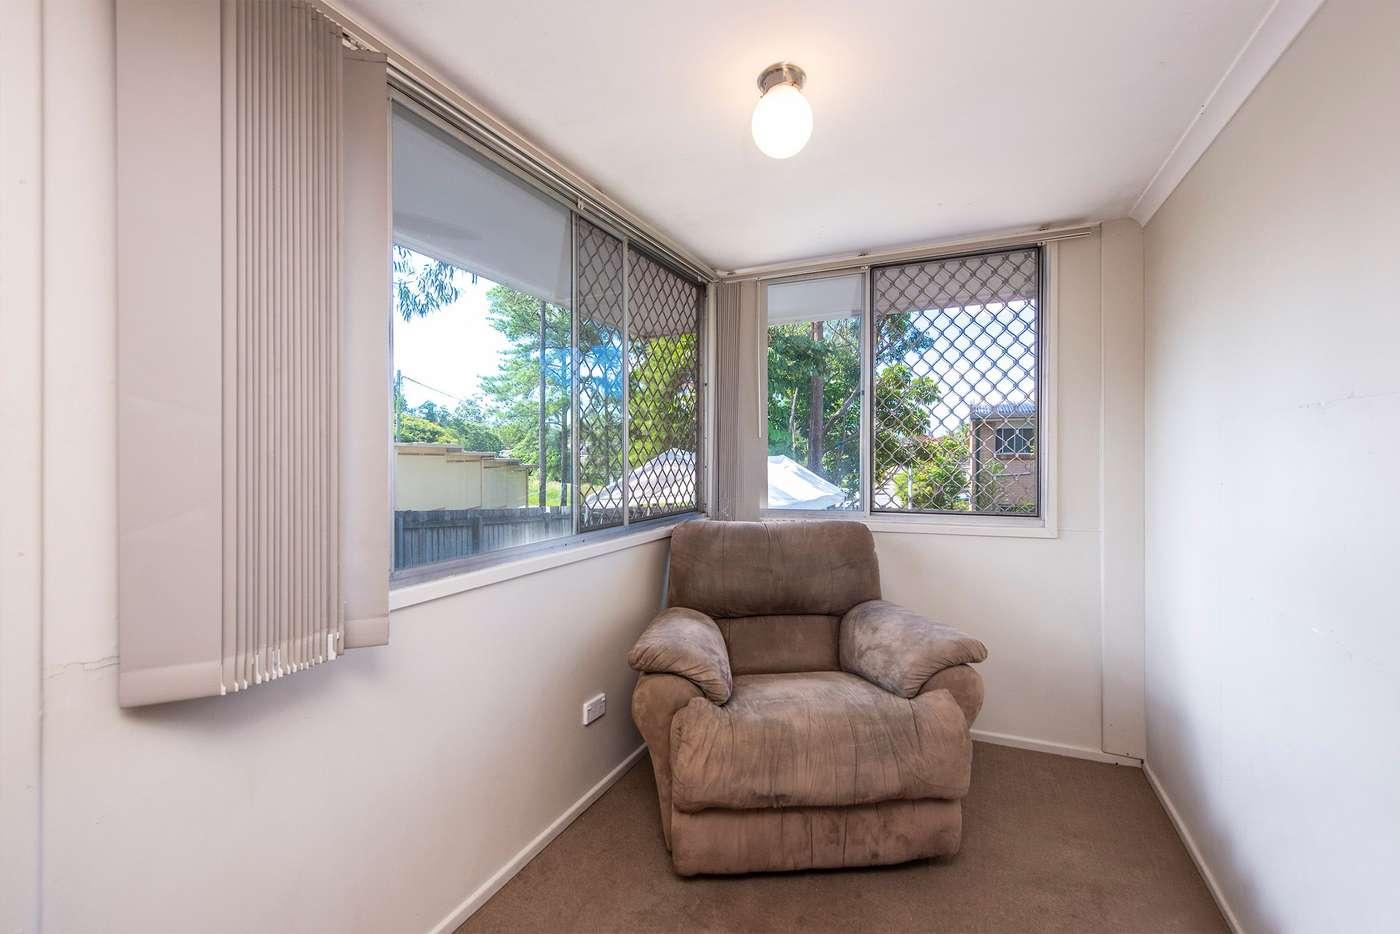 Seventh view of Homely house listing, 17 Bramston Street, Woodridge QLD 4114